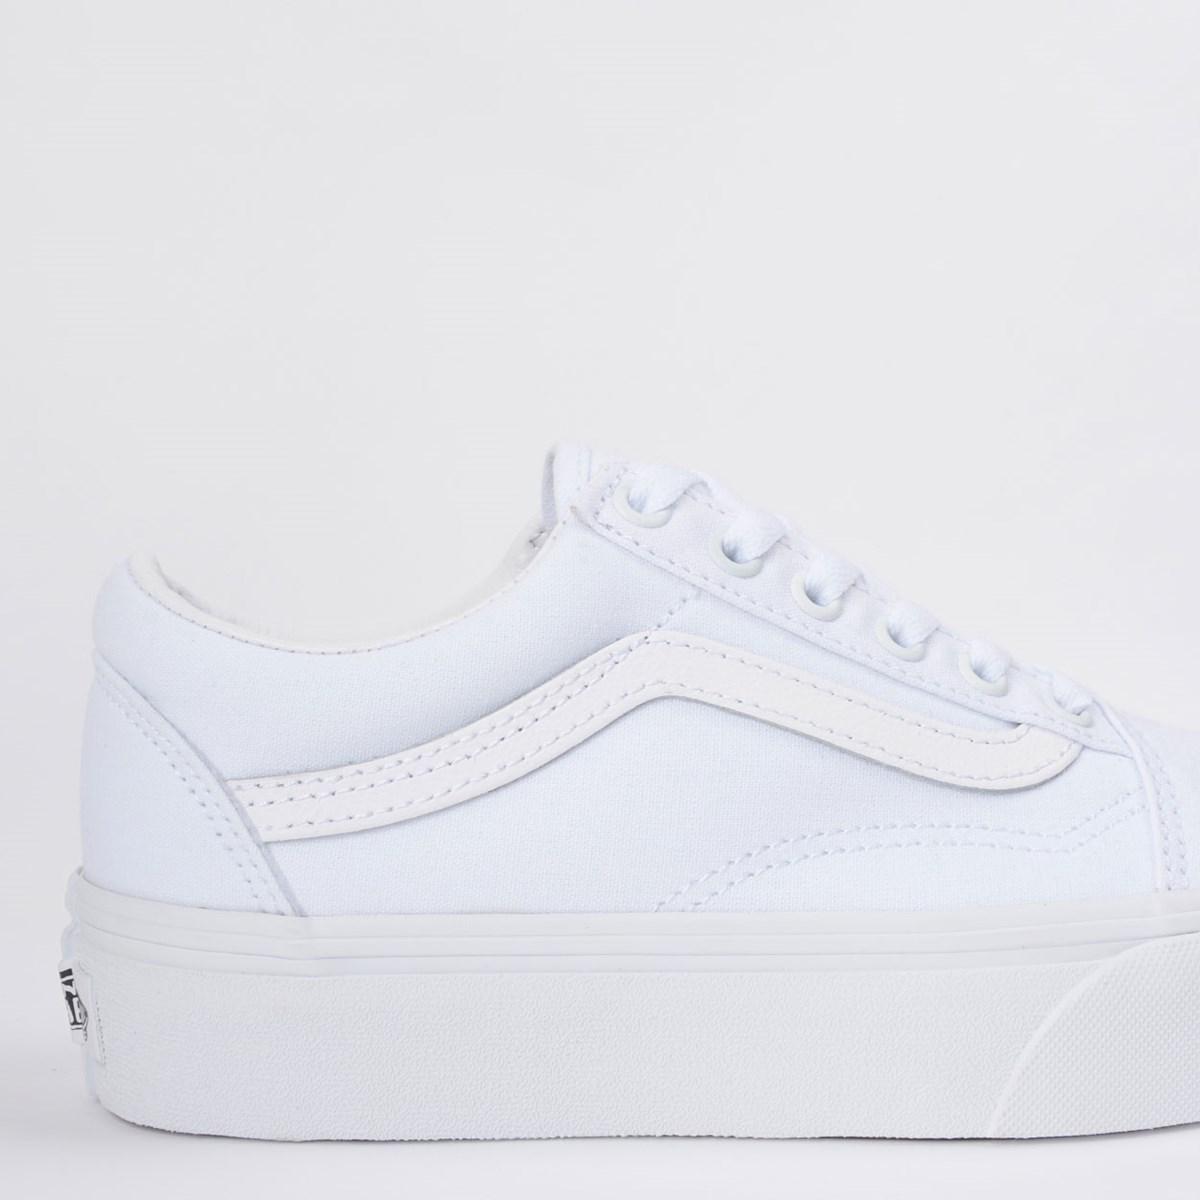 Tênis Vans Old Skool Platform True White VN0A3B3UW00